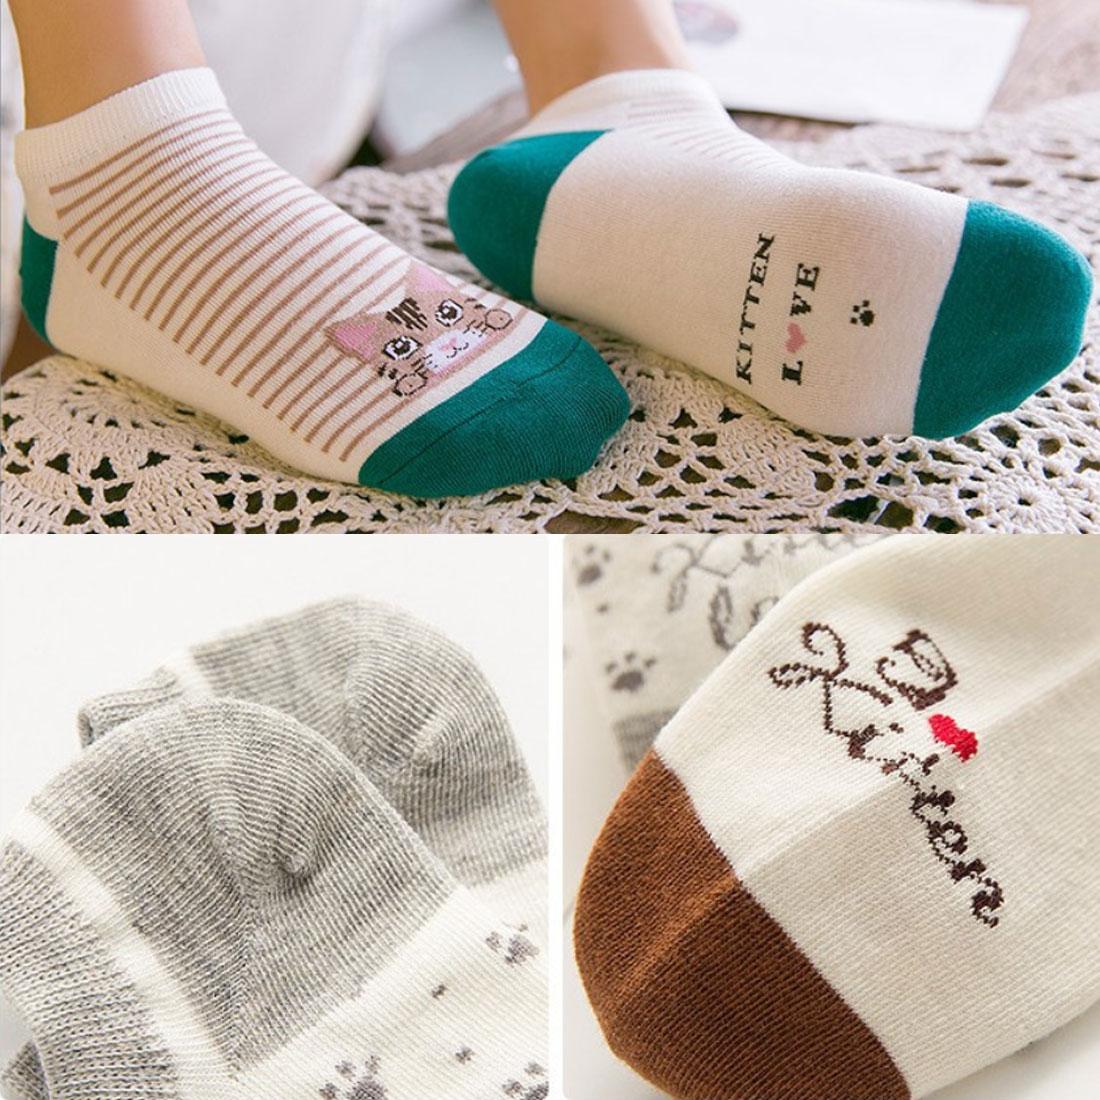 Top Sell 5 Pairs/Set Kawaii Women Socks Cute Cartoon Cat Striped Cotton Socks for Female Girls